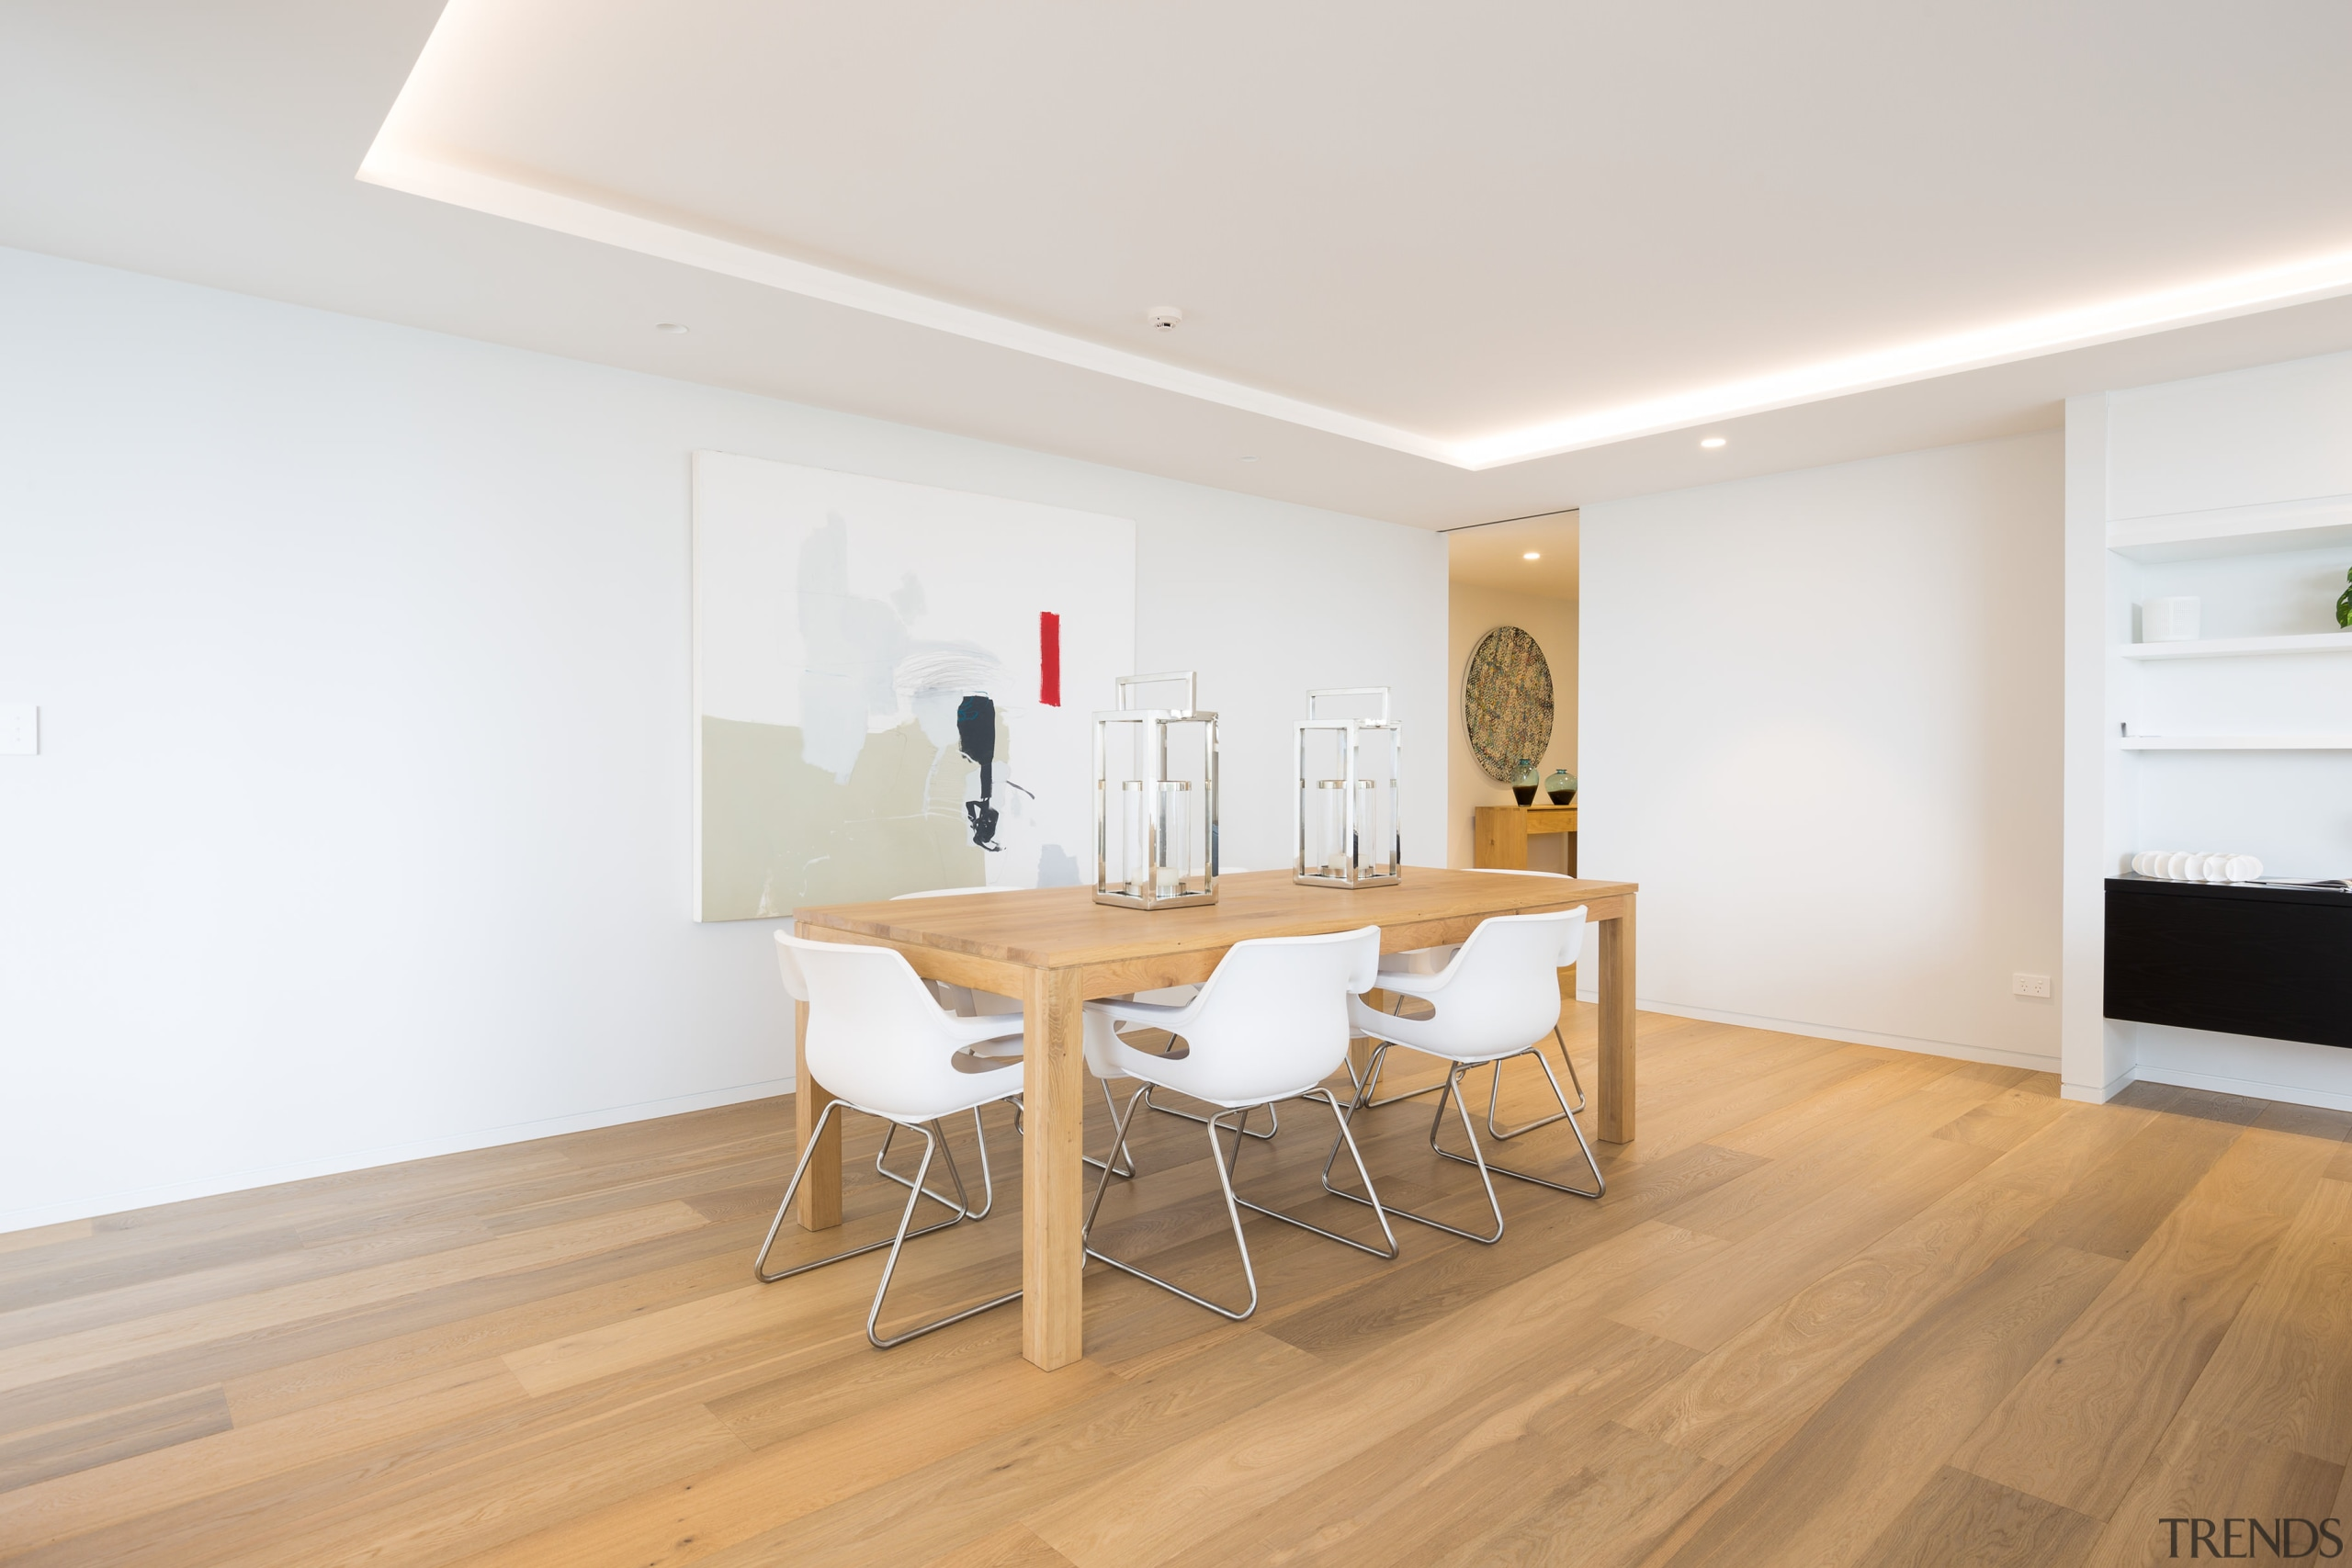 On this development, the apartments serene interiors are apartment, ceiling, floor, flooring, furniture, hardwood, house, interior design, laminate flooring, property, real estate, room, table, wood, wood flooring, white